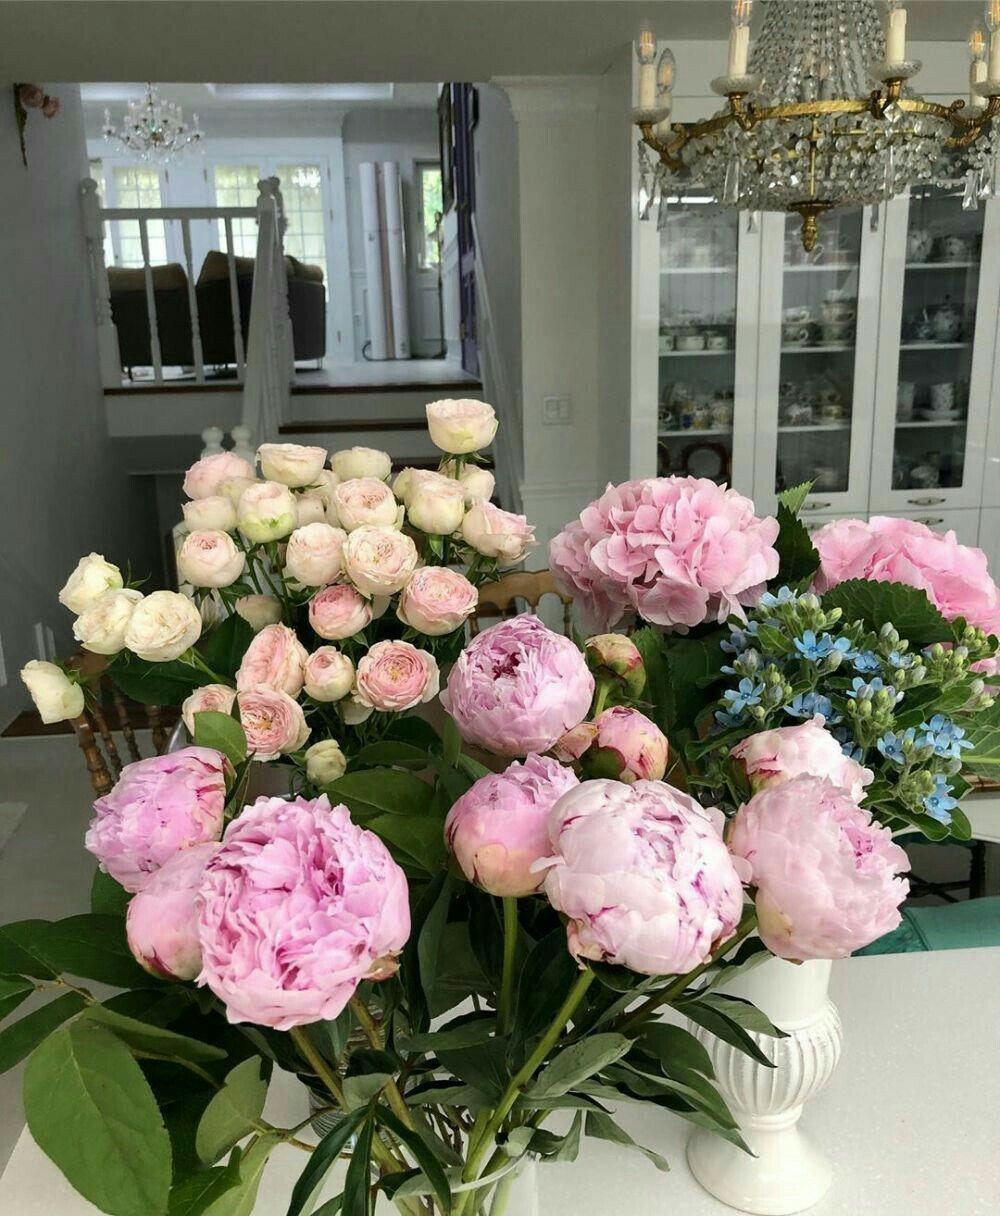 Flowers In 2020 Piones Flowers Flowers Pretty Flowers